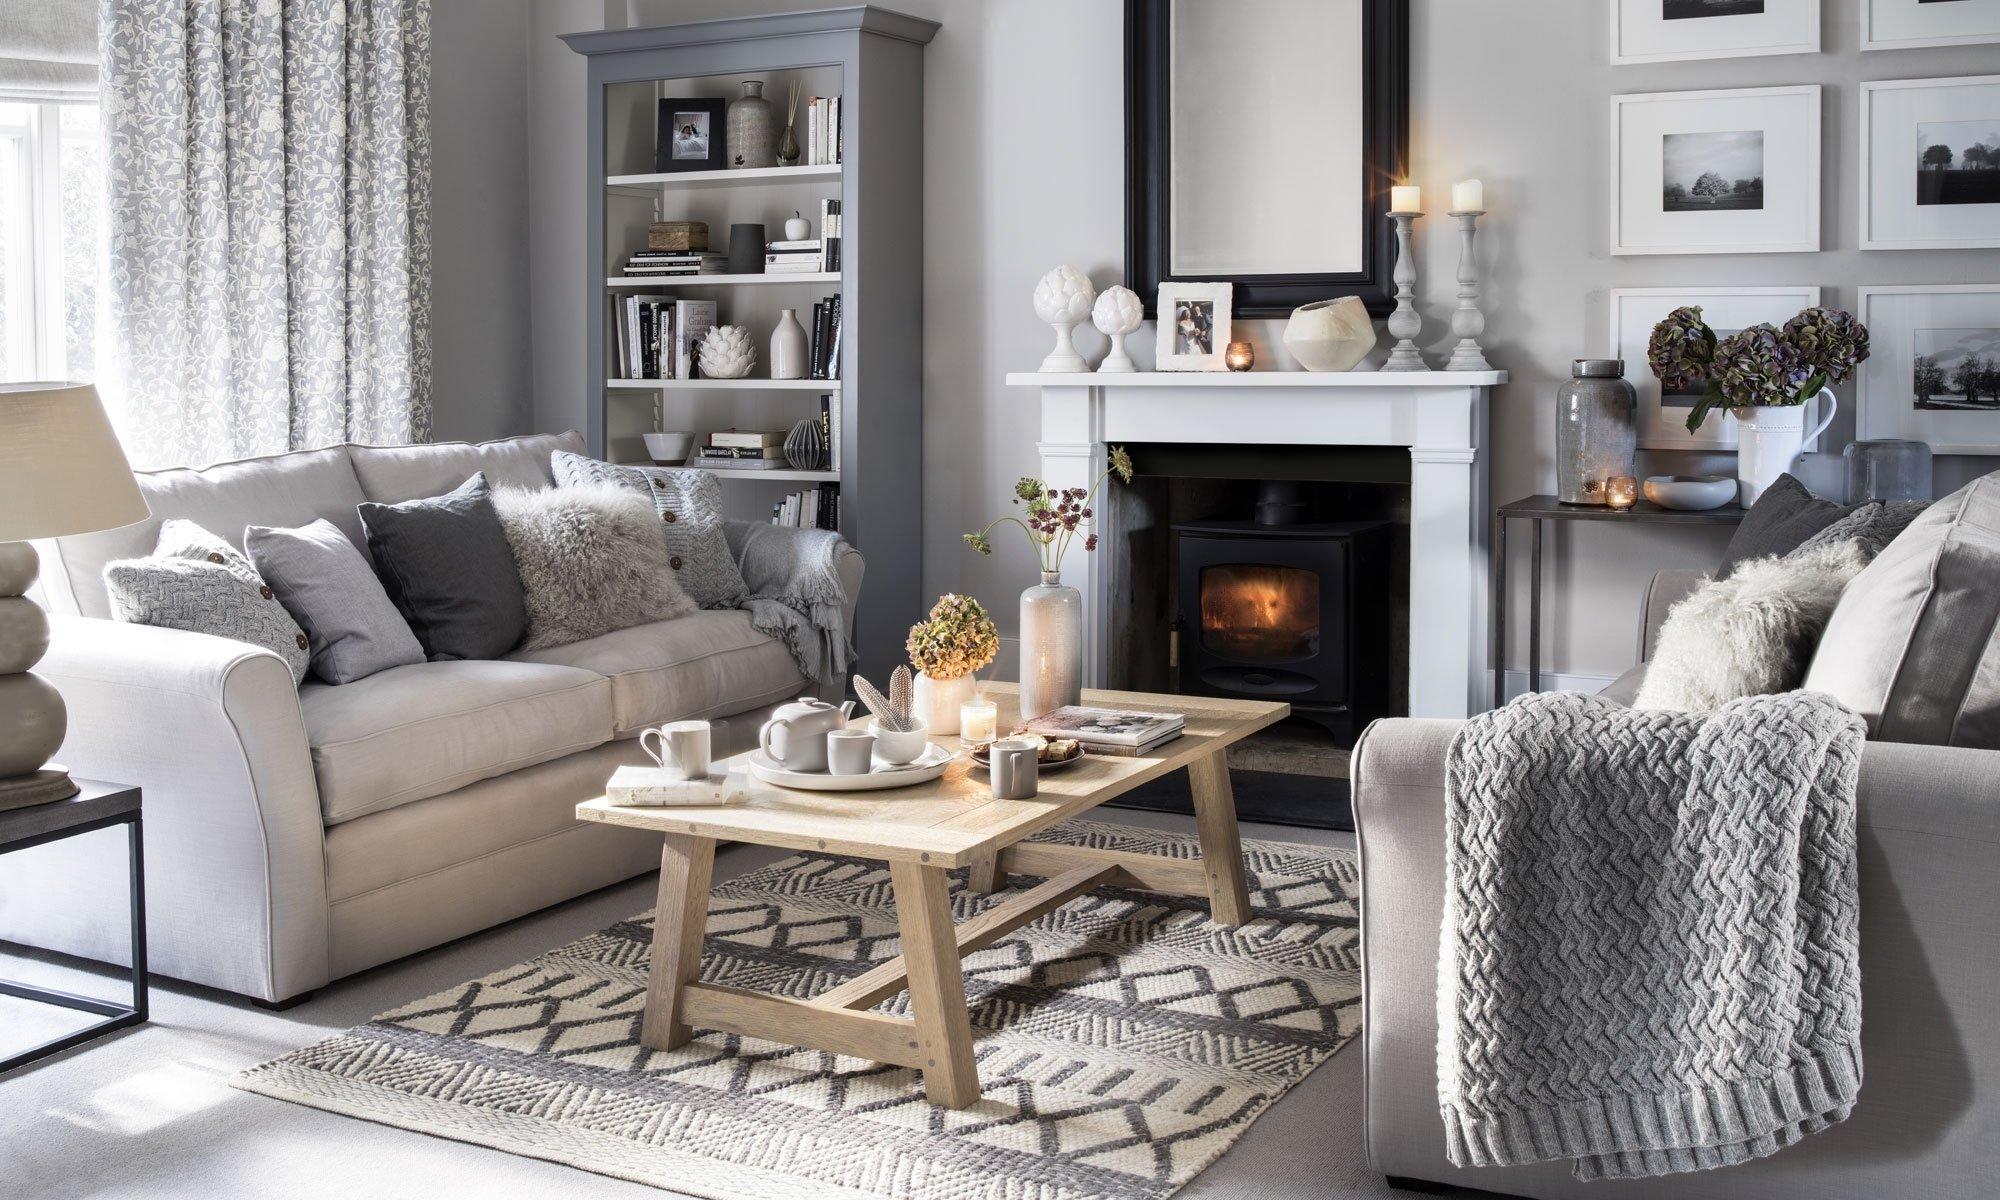 10 Elegant Living Room Furniture Decorating Ideas living room ideas designs and inspiration ideal home 3